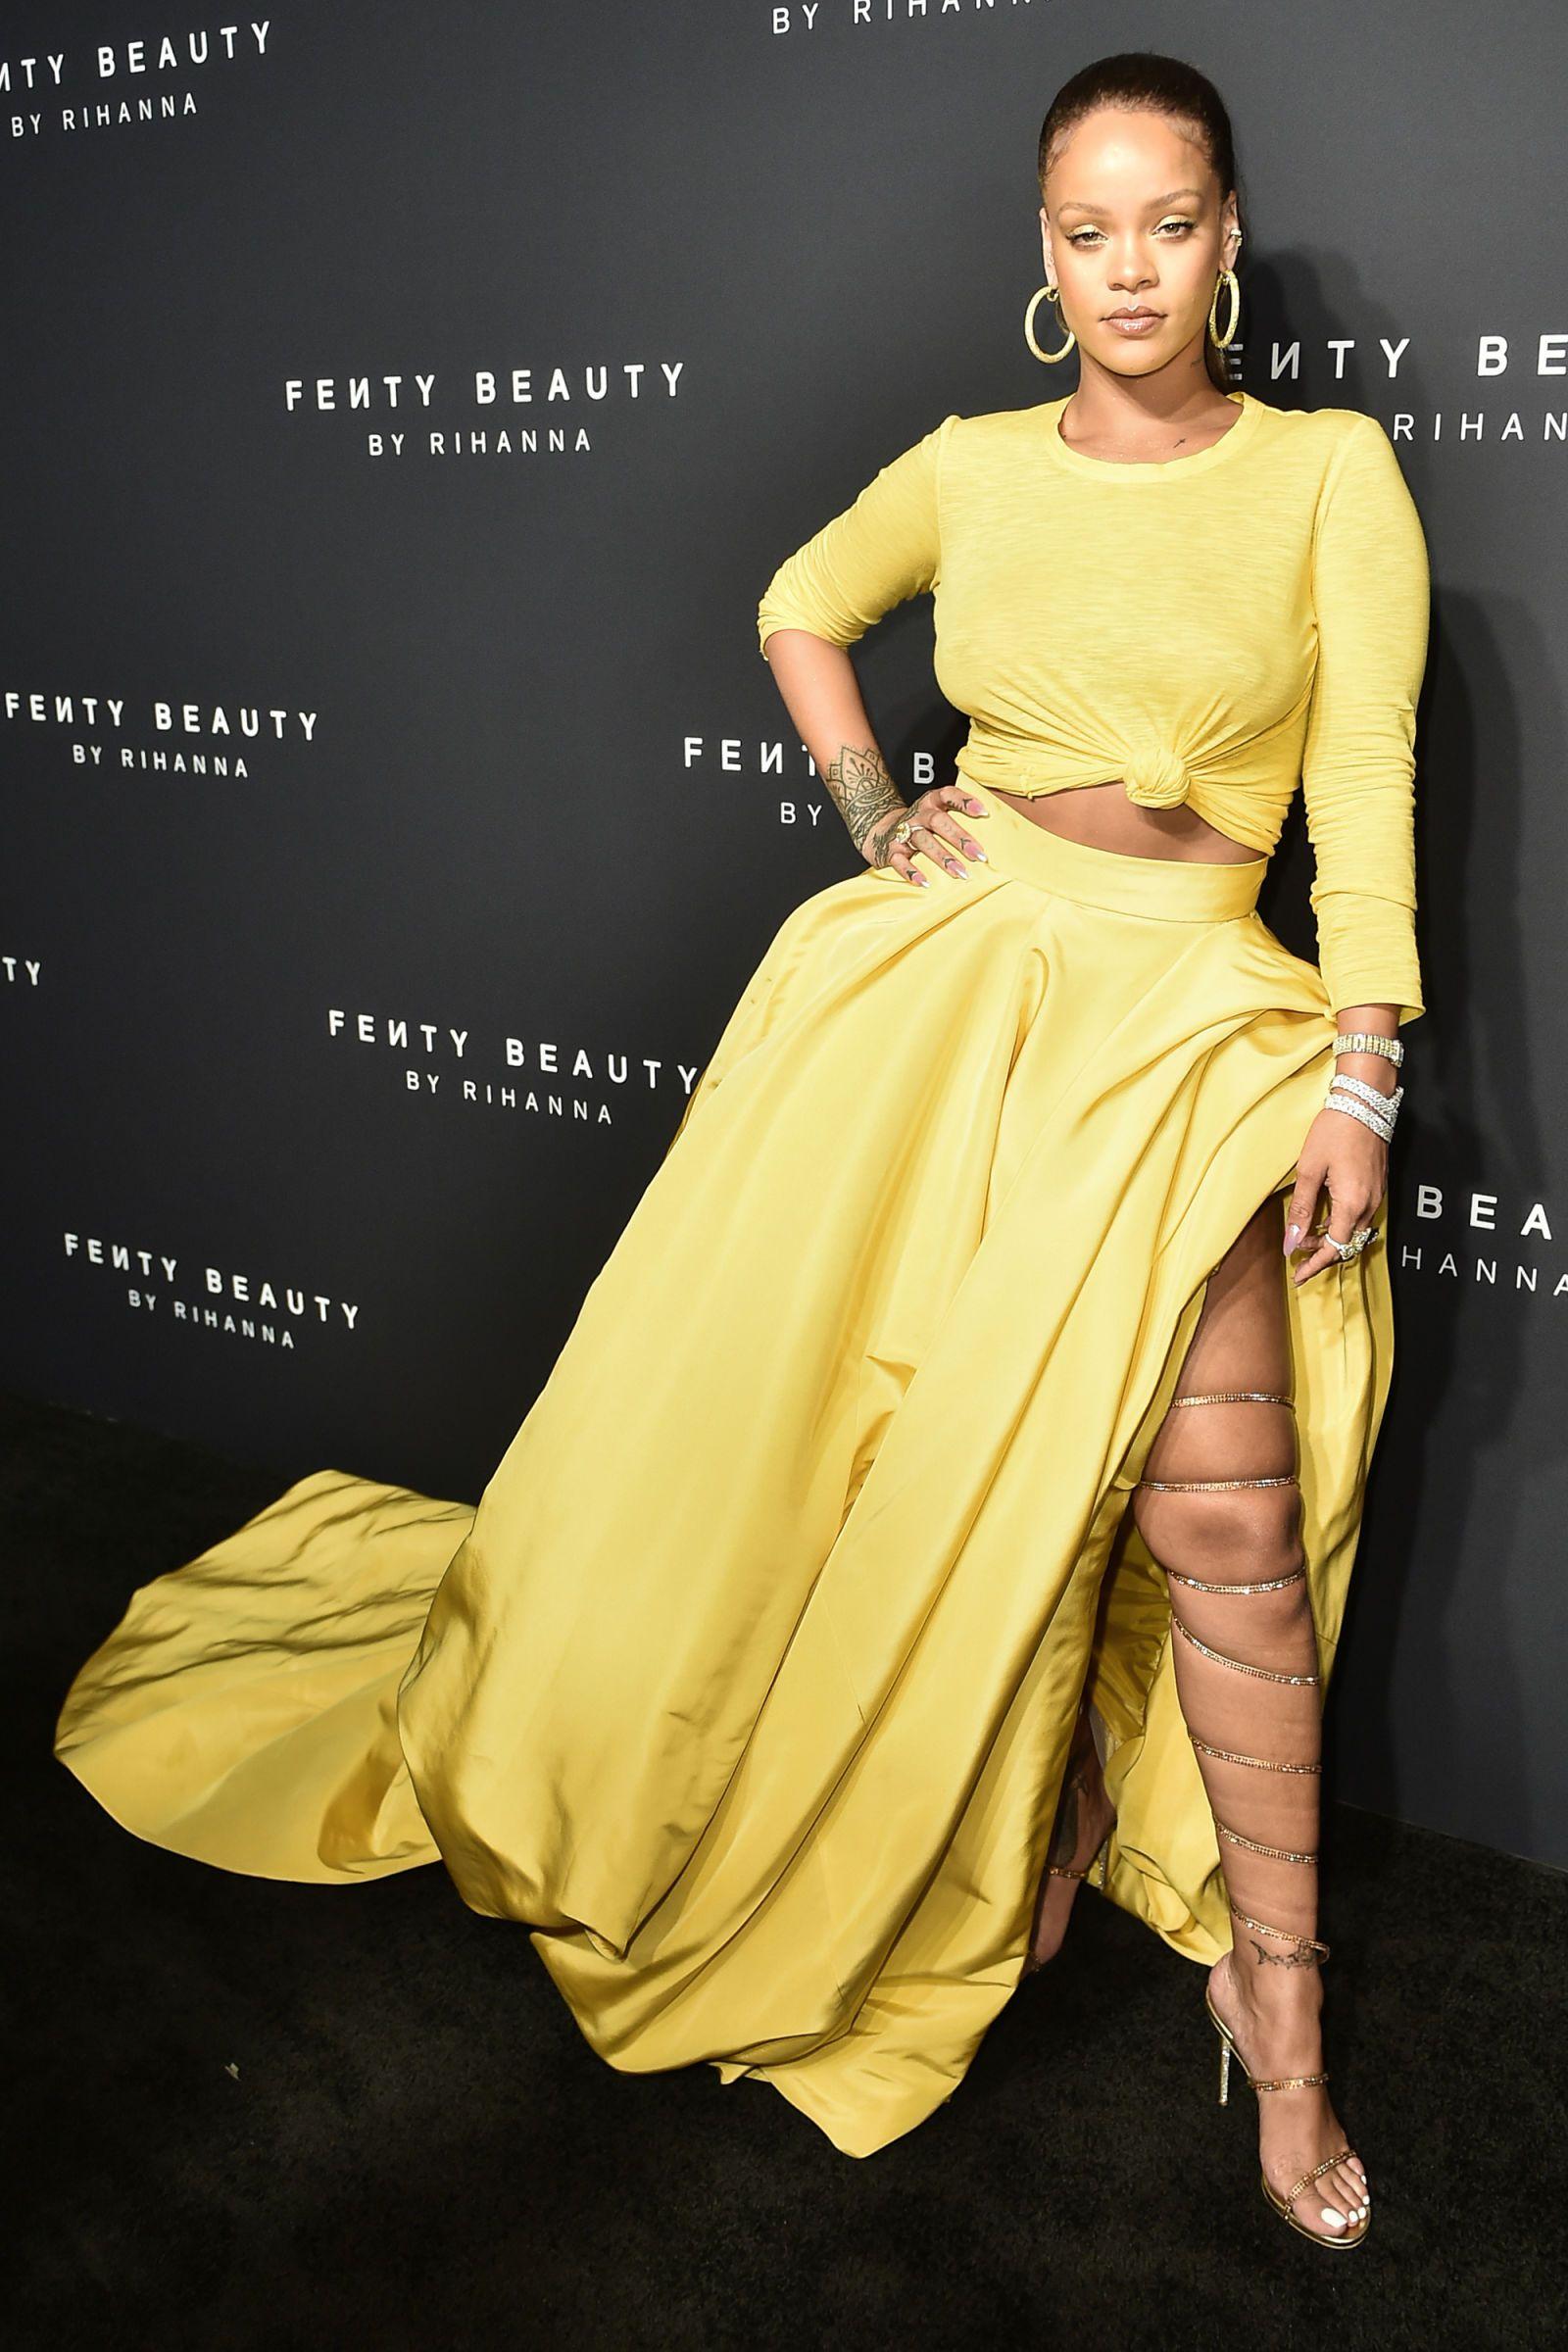 Yellow dress rihanna  Rihanna offers a modern take on uBeauty and the Beastus Belle